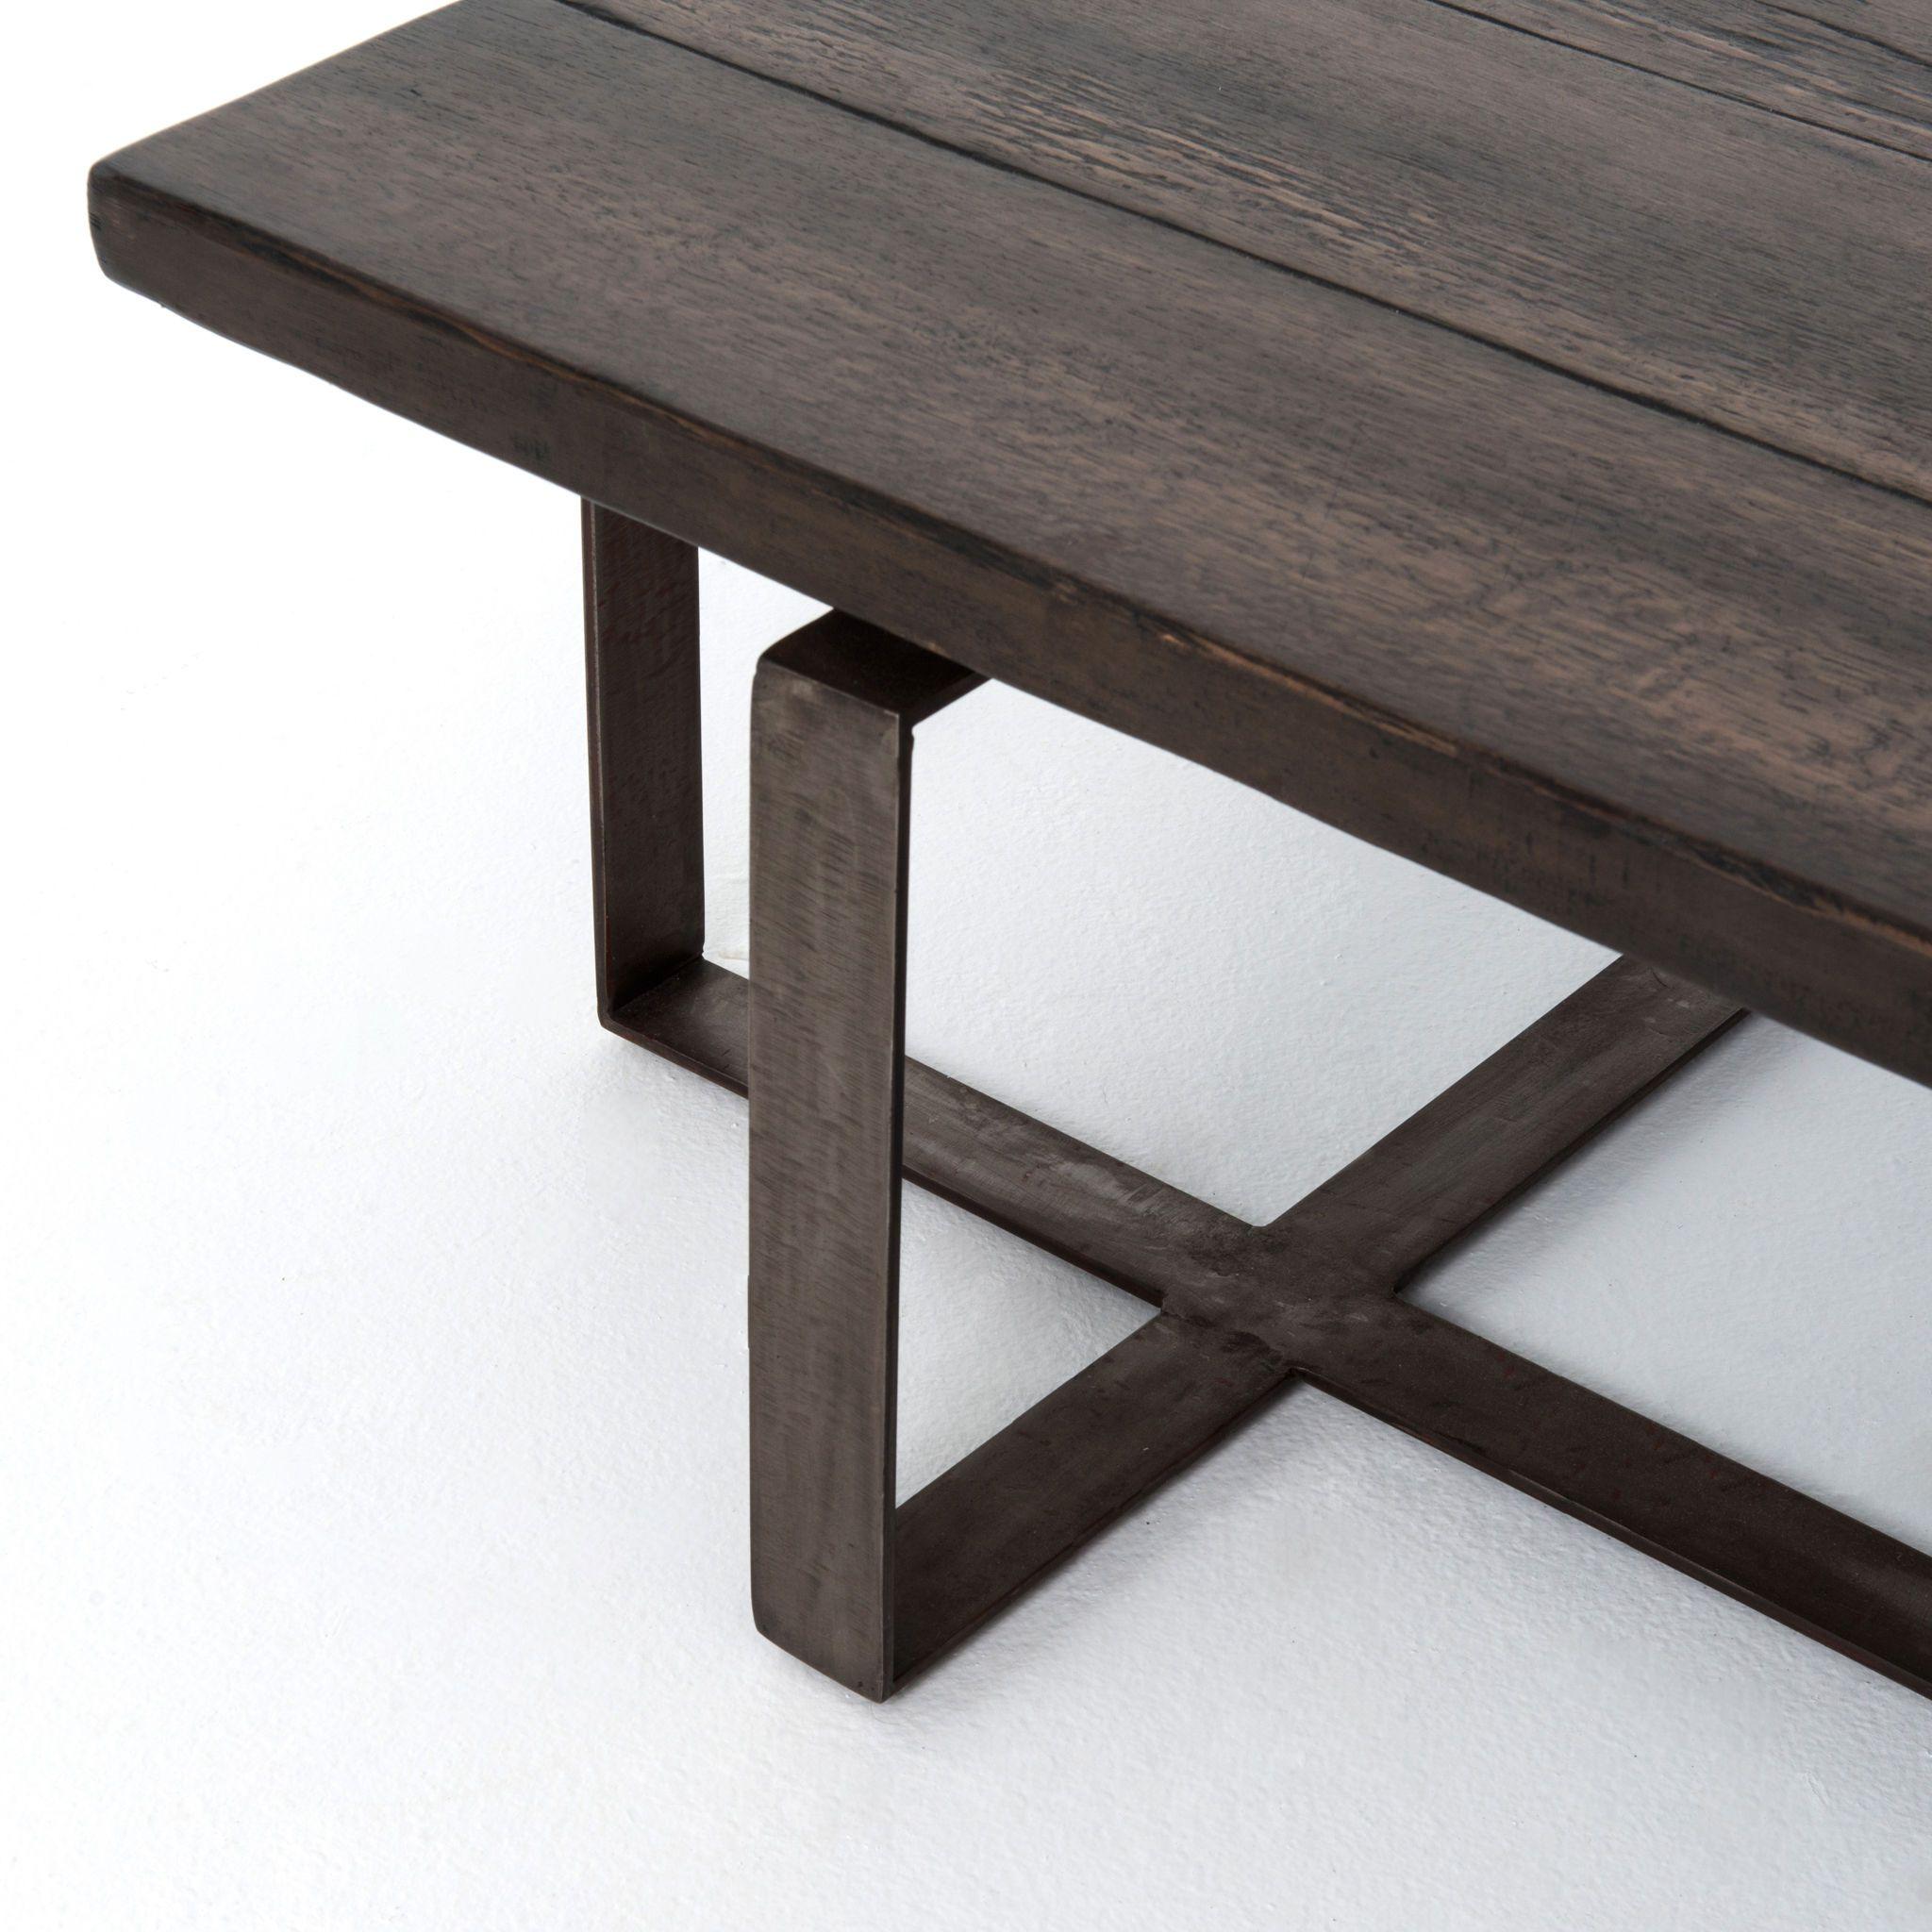 Living Room Brant Coffee Table Uwes 005 Geometric Coffee Table Grey Oak Coffee Table